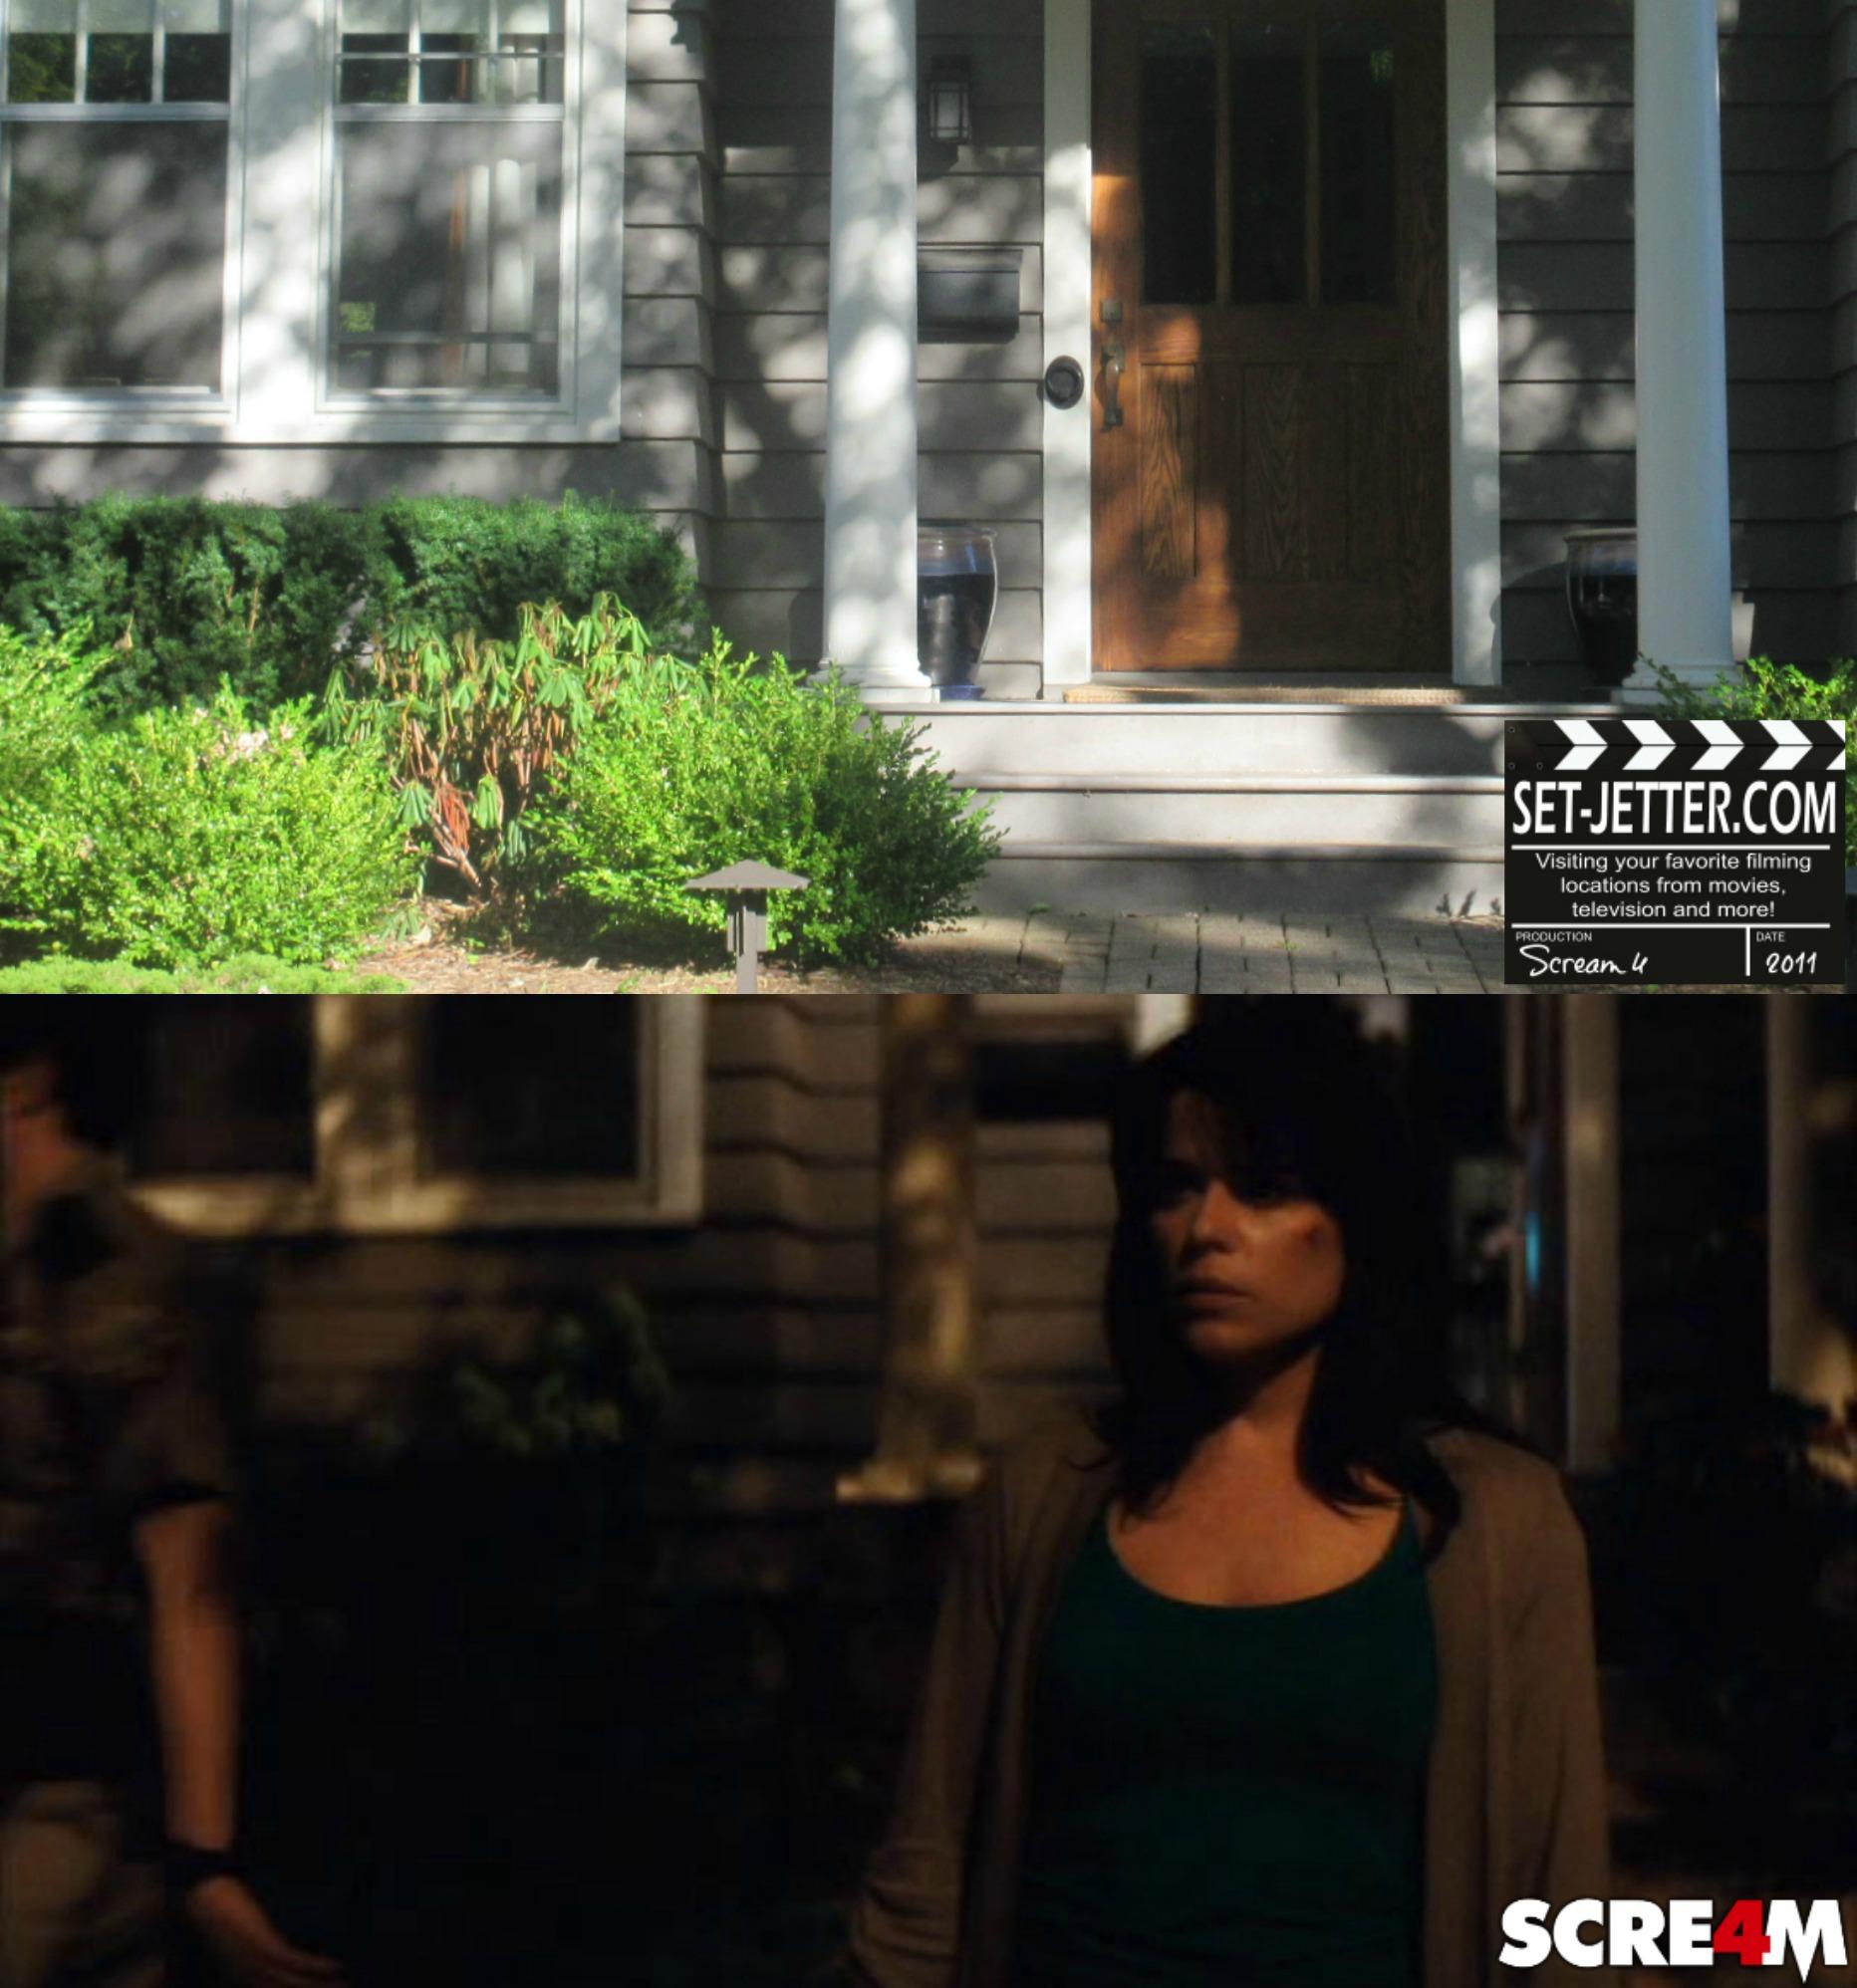 Scream4 comparison 130.jpg